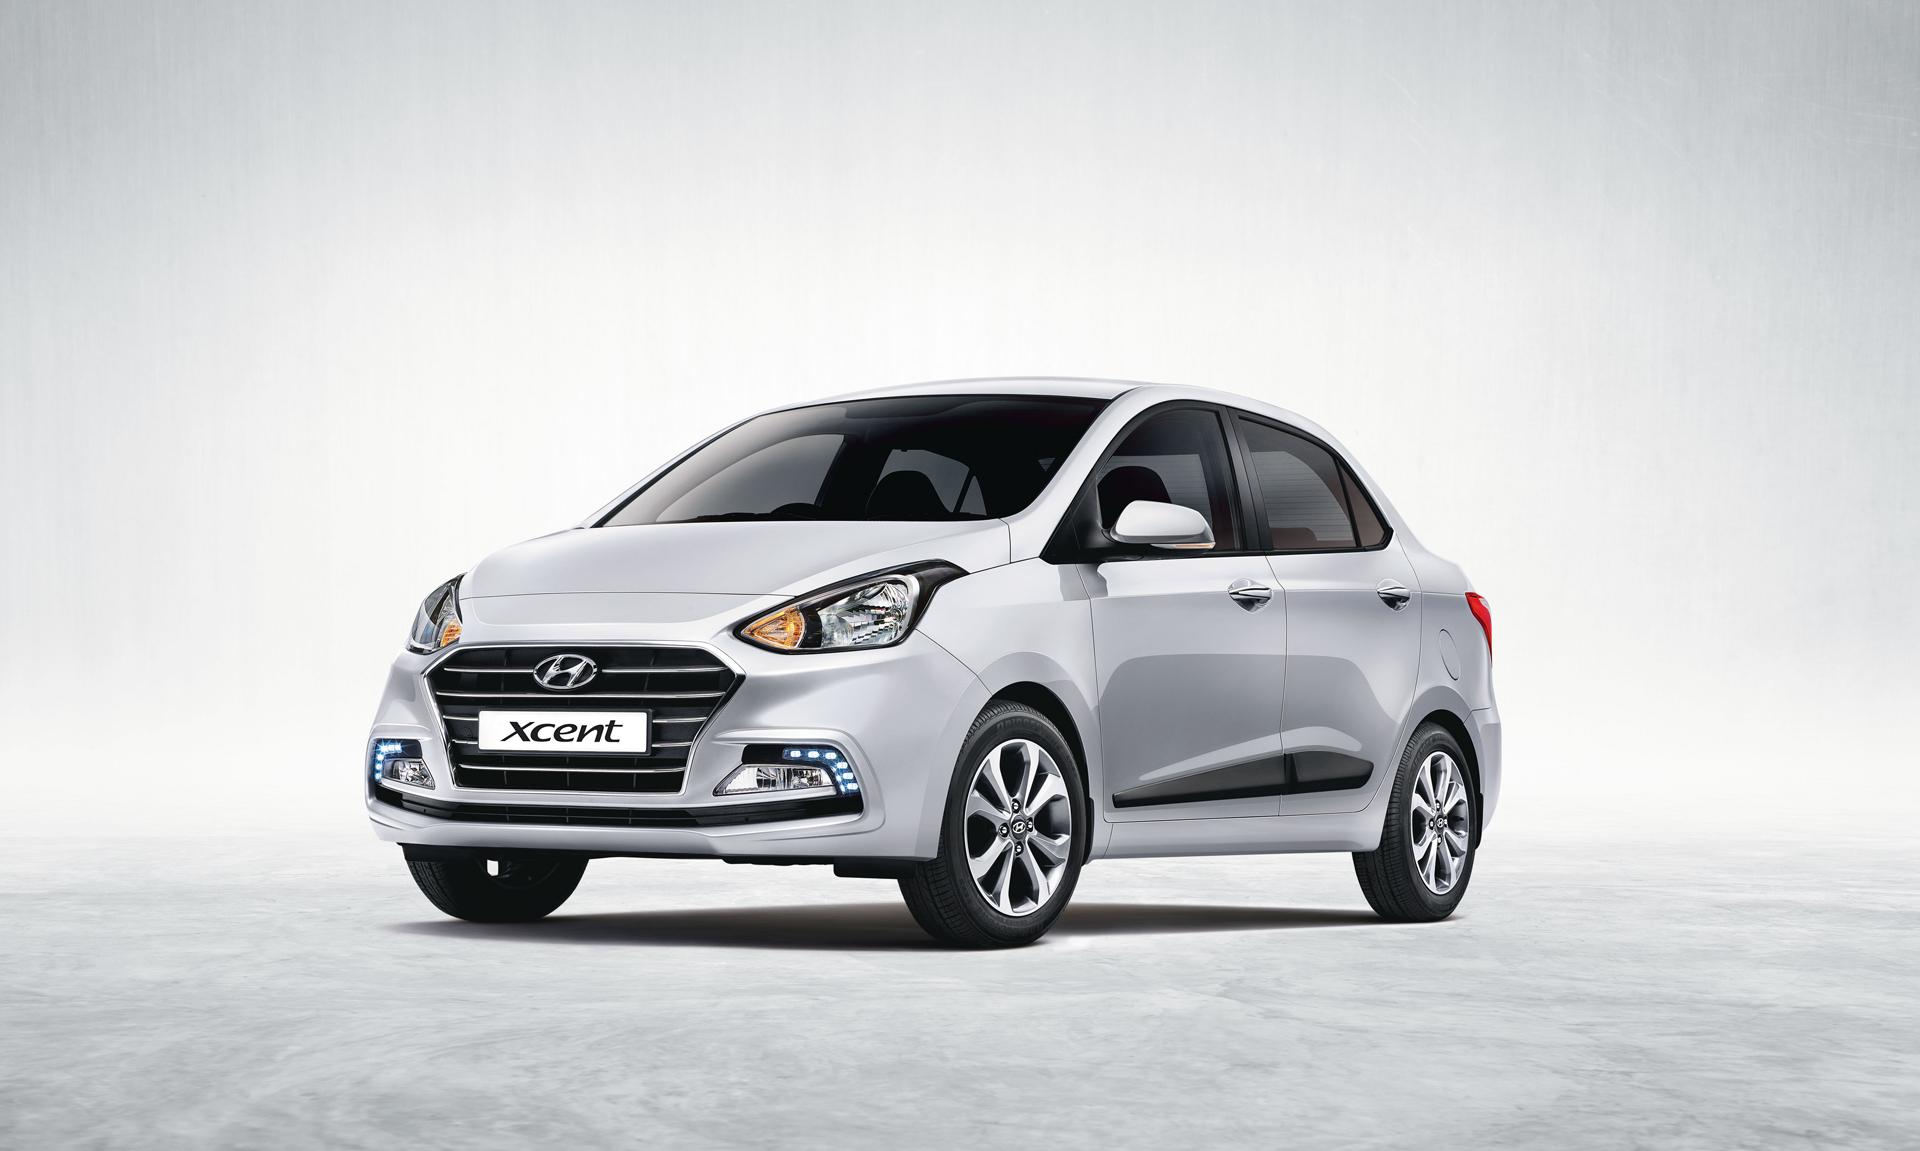 Hyundai Xcent 2017 S AT Image